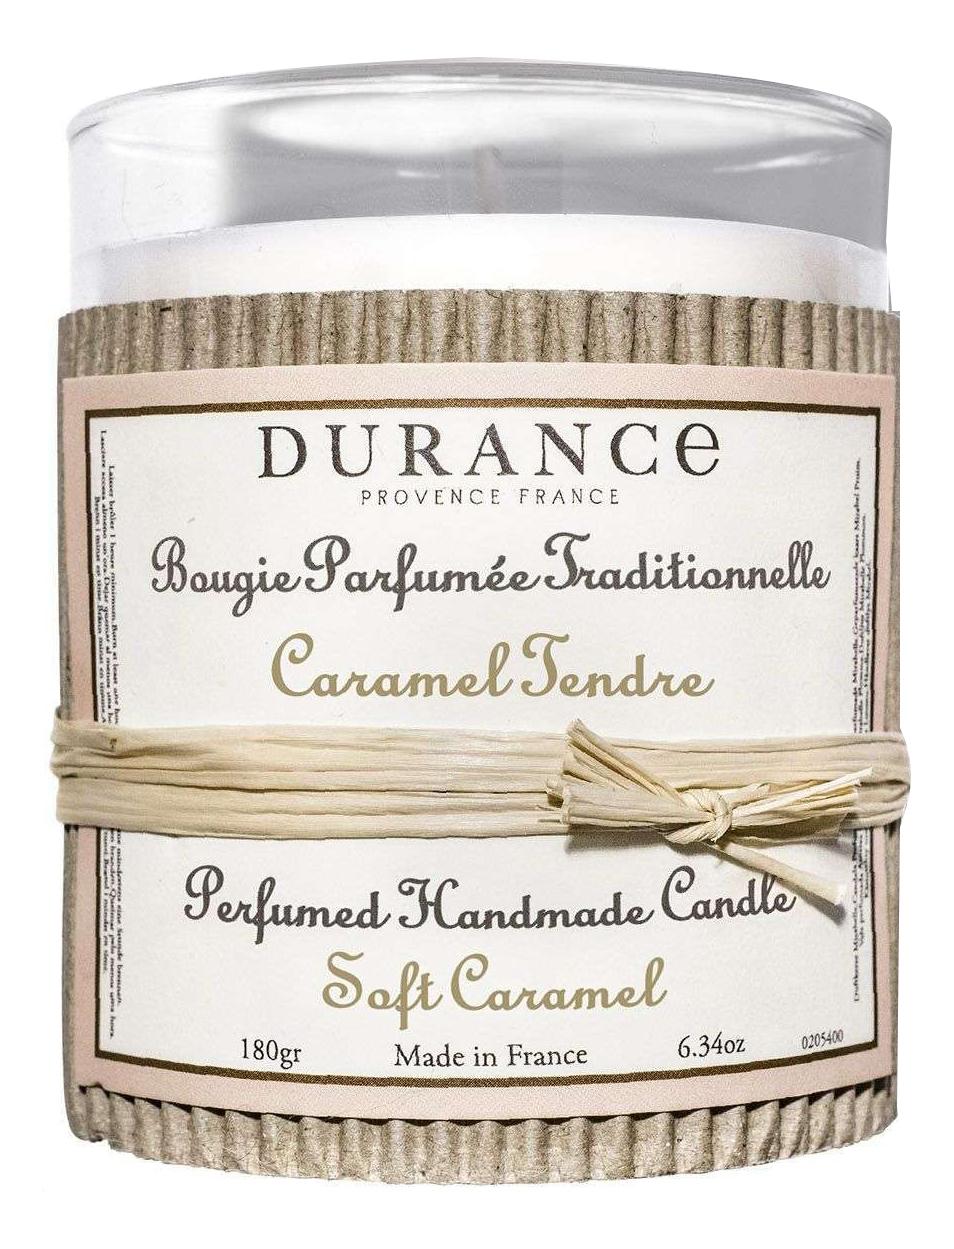 Купить Ароматическая свеча Bougie Parfumee Fraditionnelli Caramel Tendre 180мл (нежная карамель), Durance